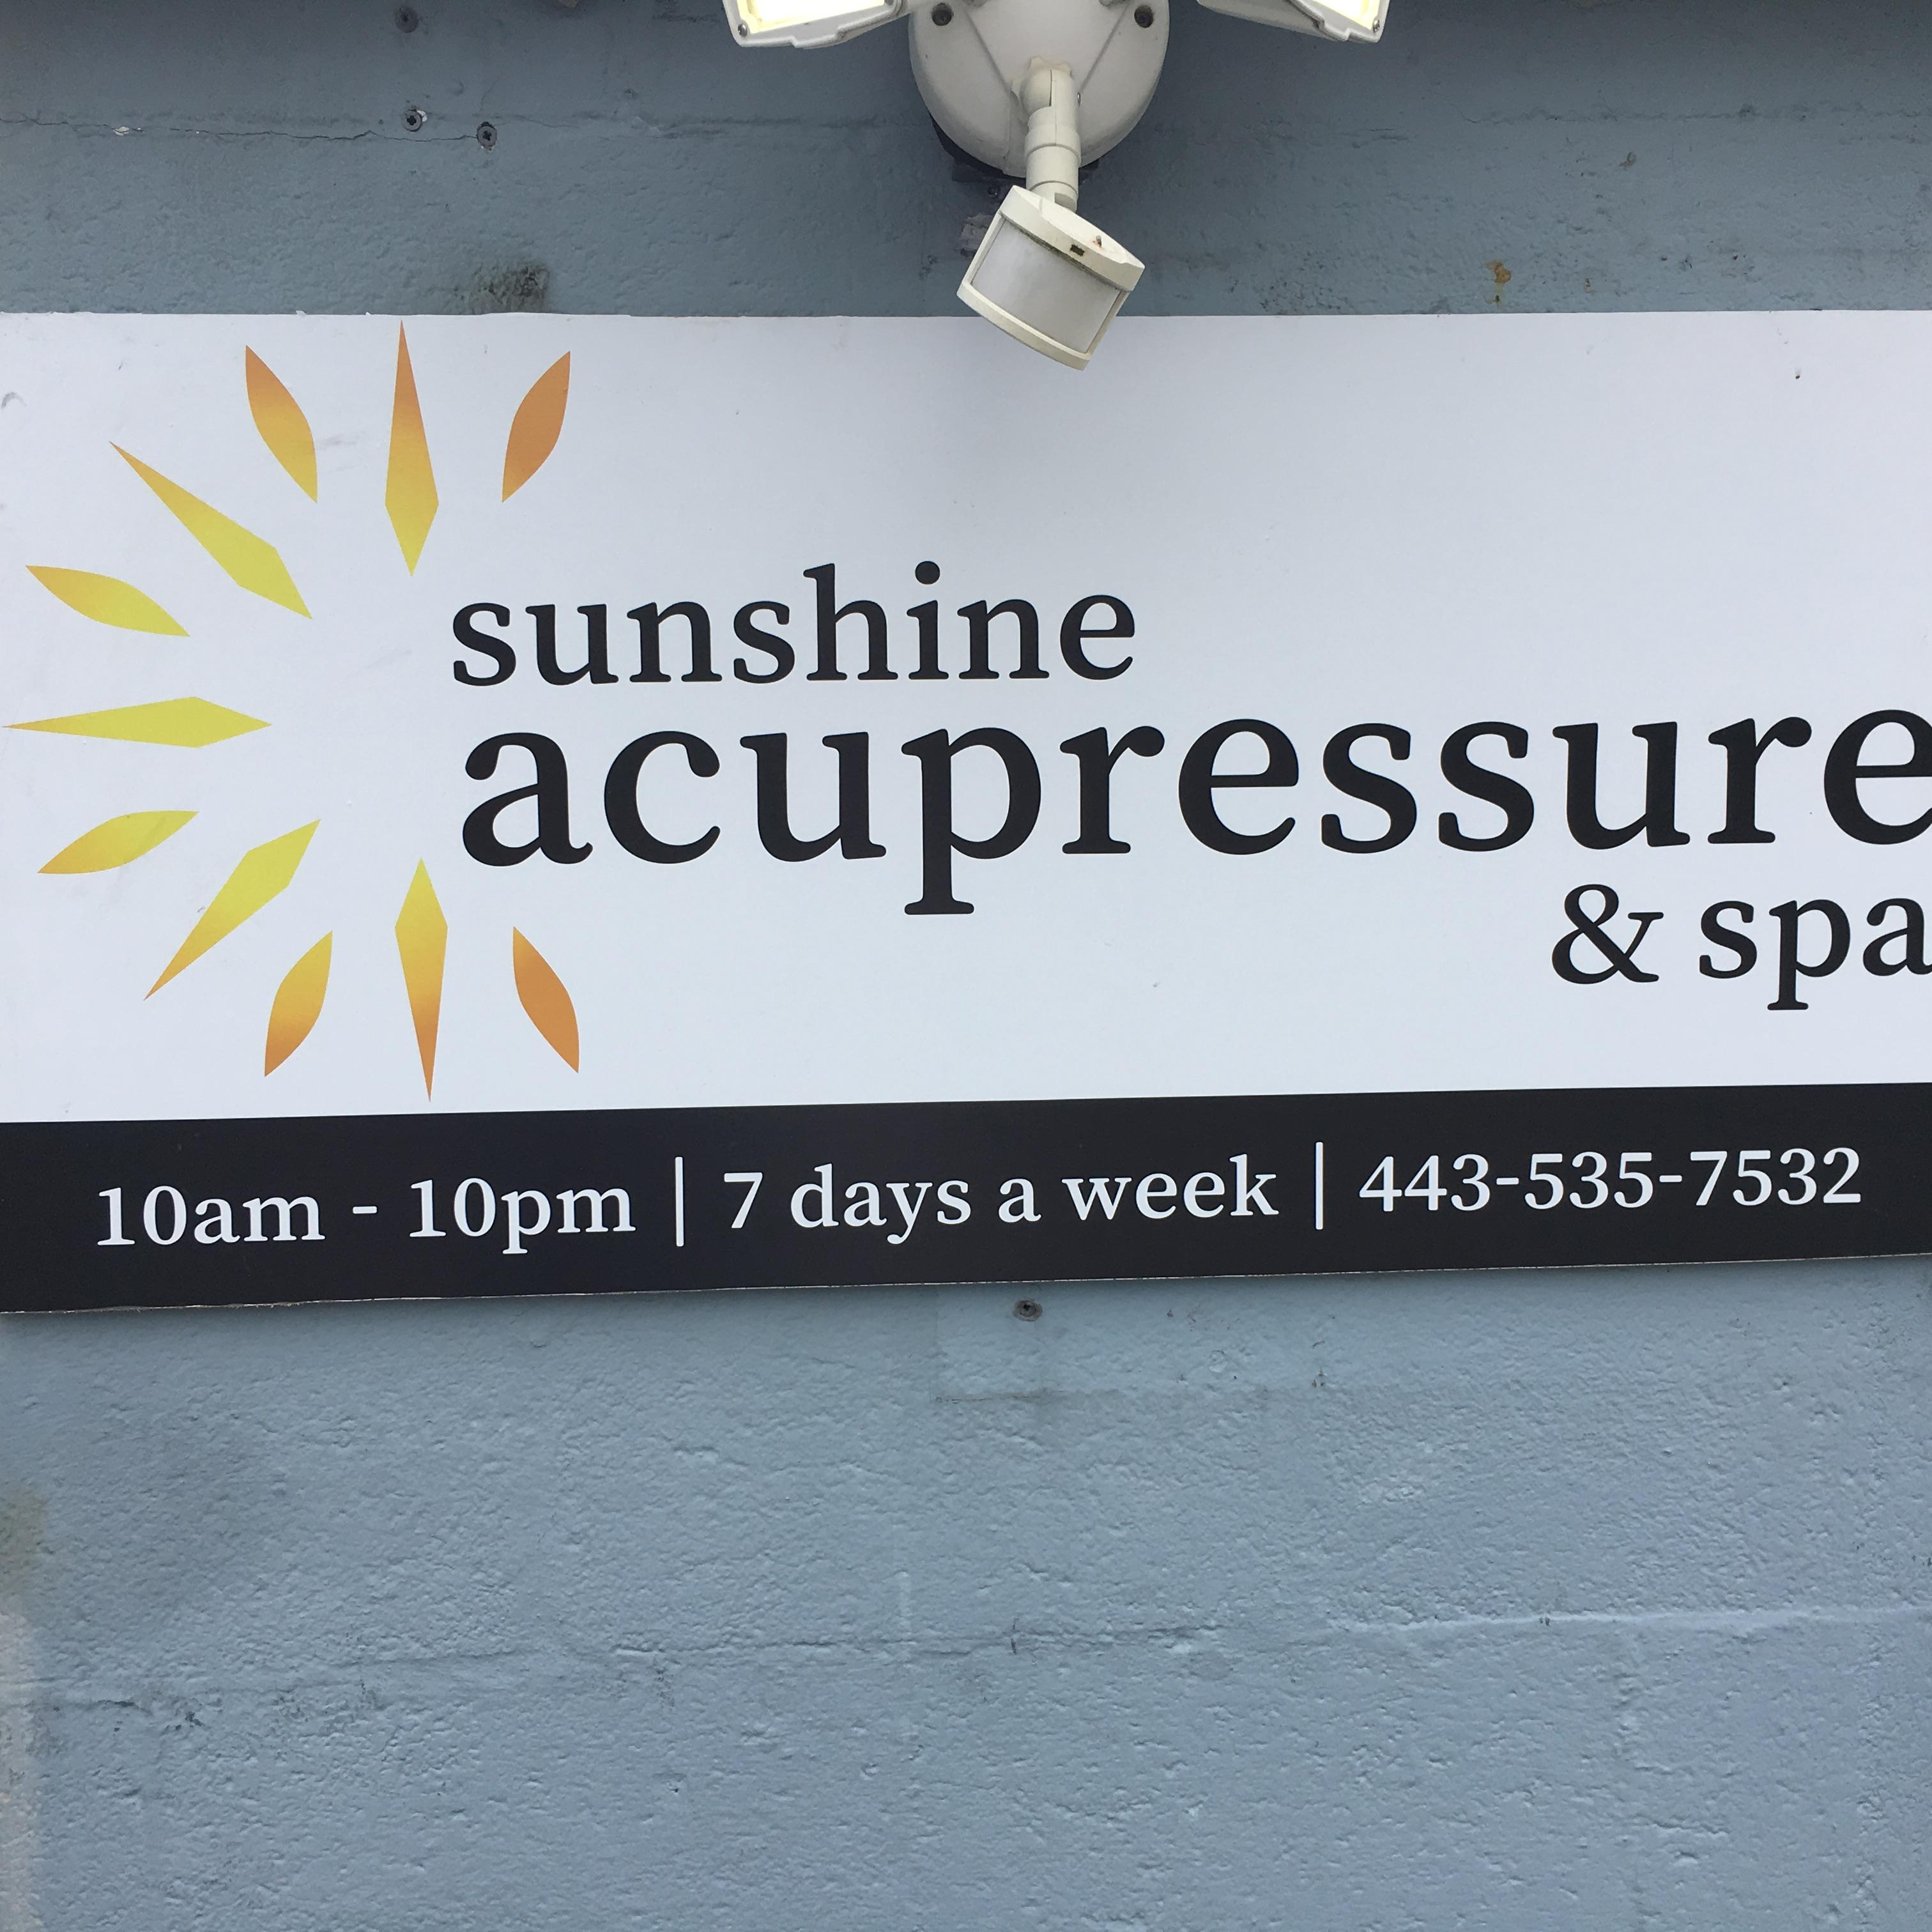 Sunshine Acupressure and Spa